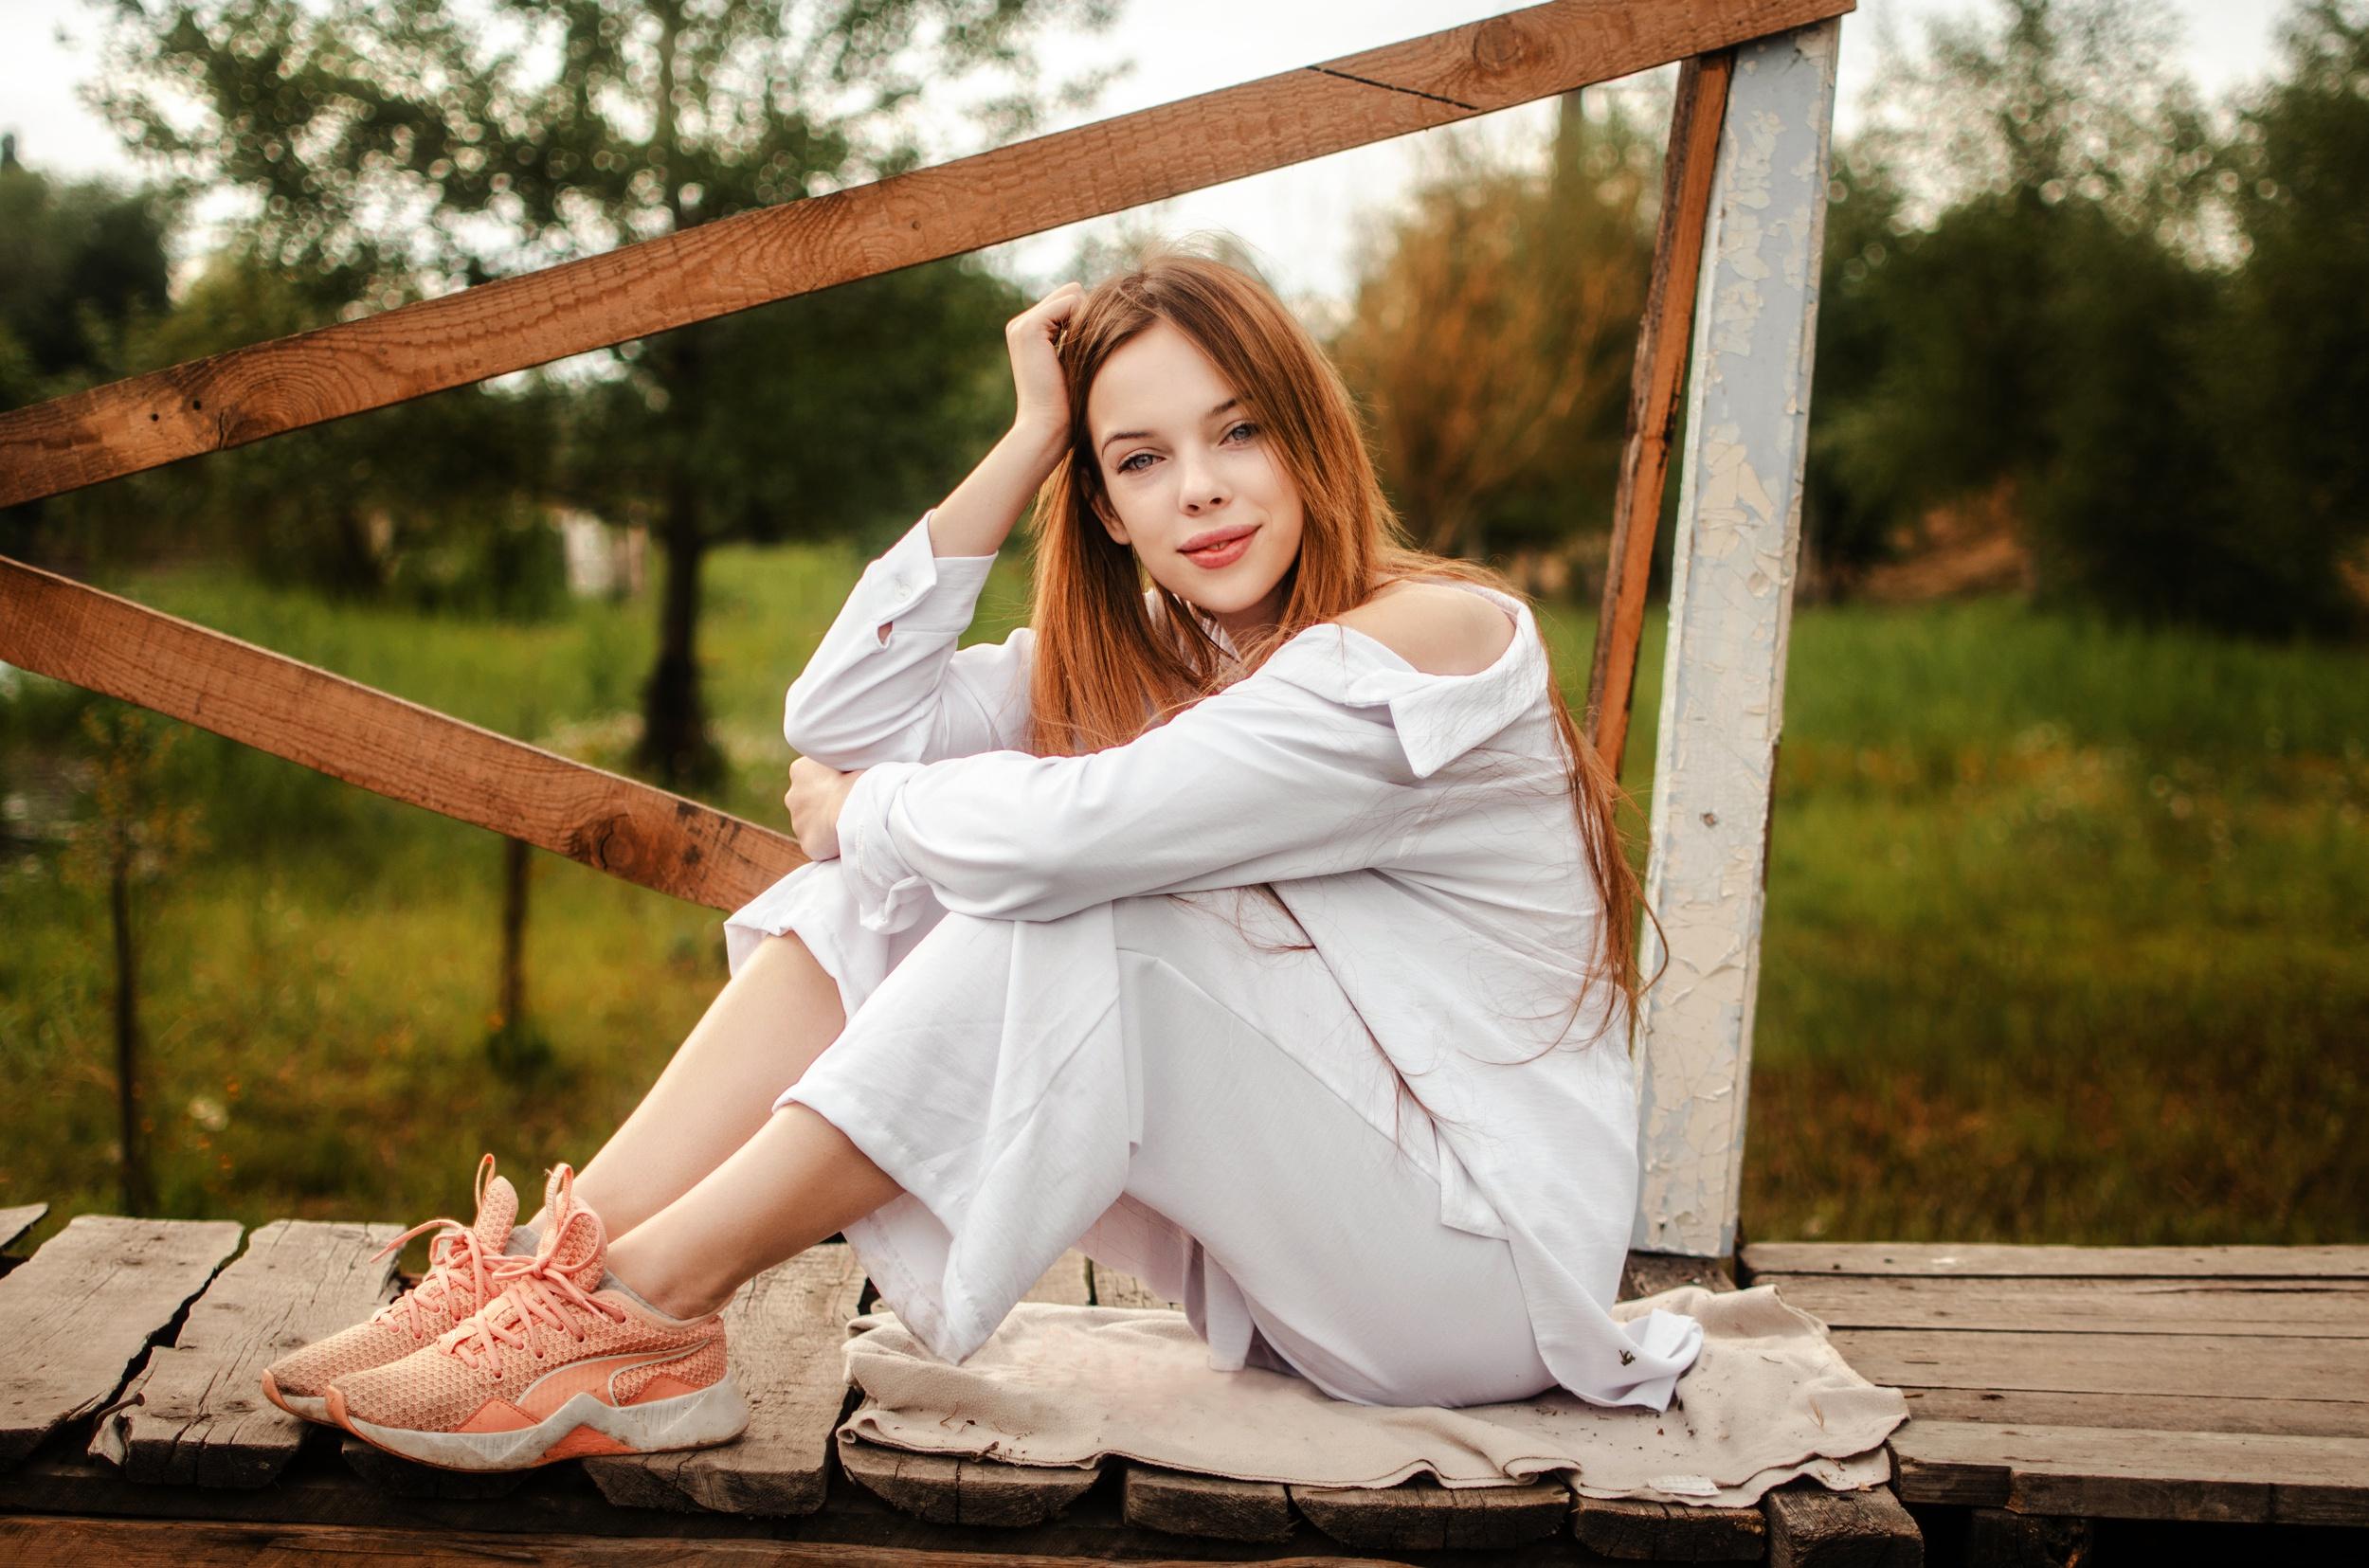 Women Model Sitting Looking At Viewer Women Outdoors Outdoors Long Hair Red Lipstick 2500x1655